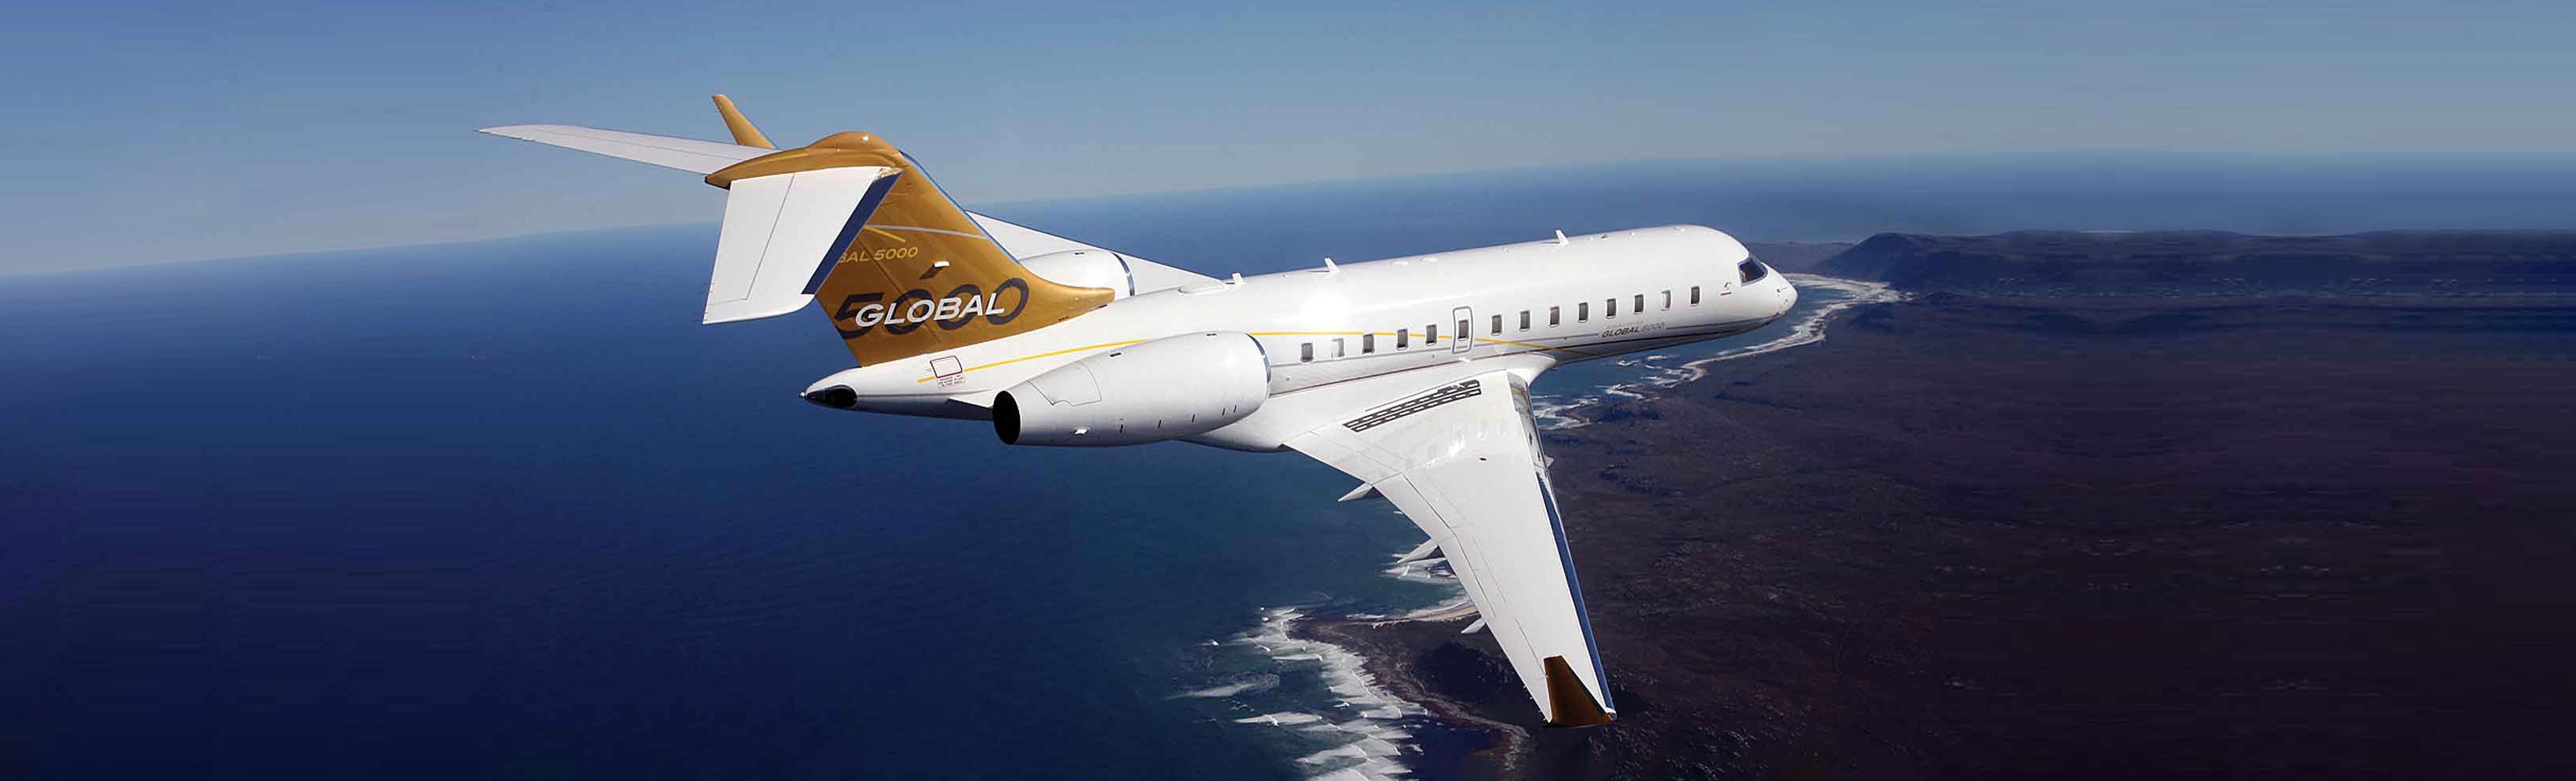 TAG航空推出首架配备顶级客舱的庞巴迪超远程环球5000欧洲包机服务